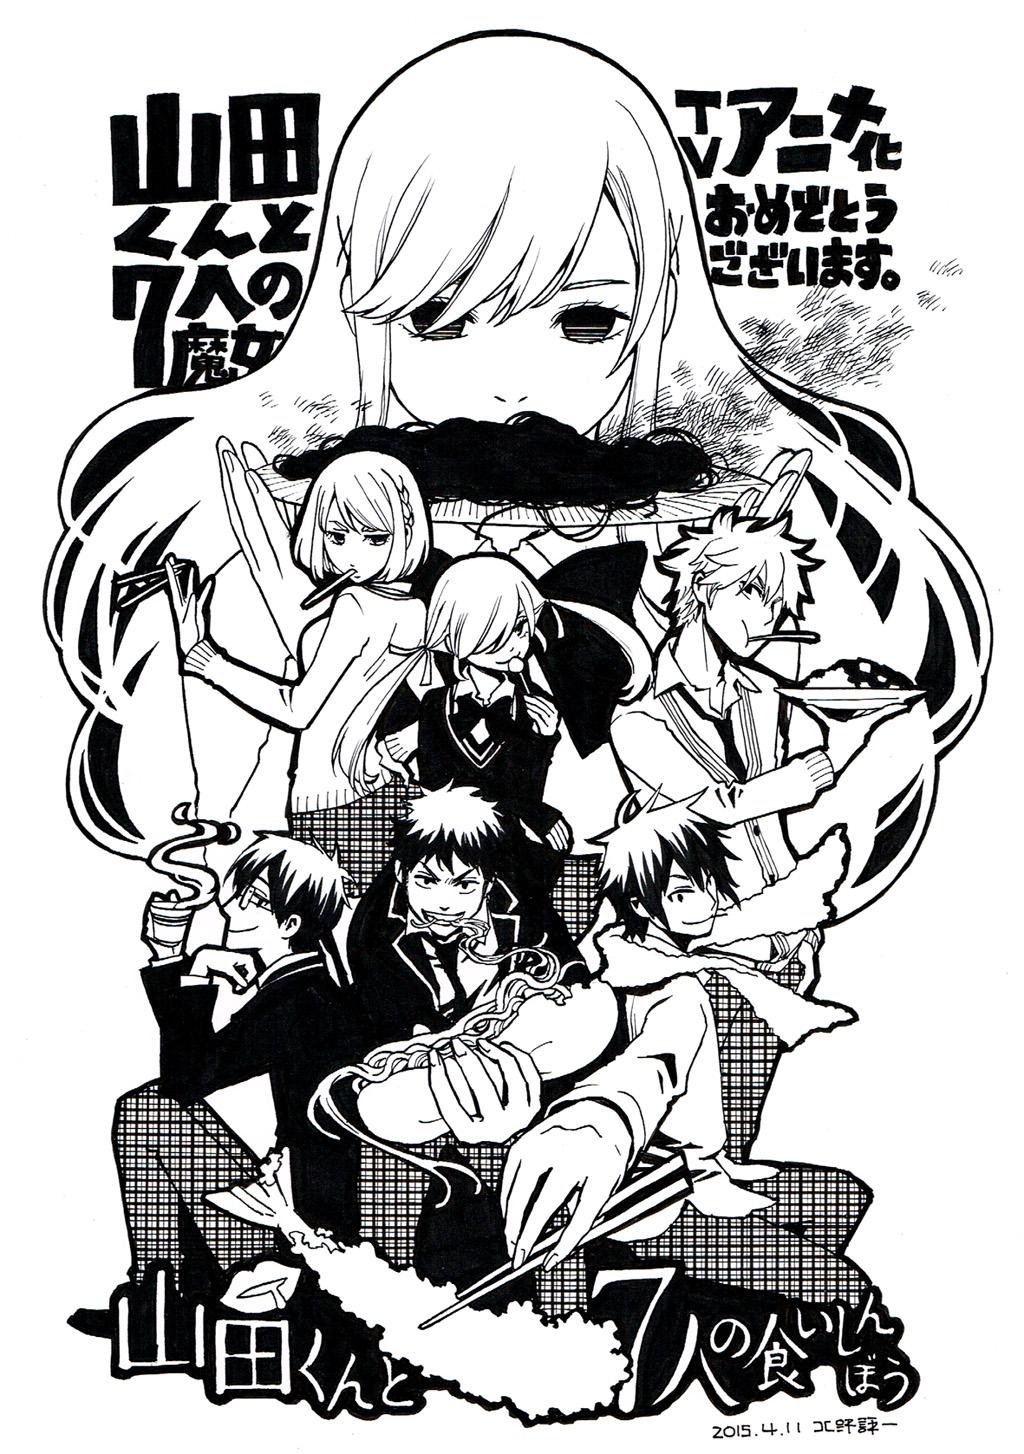 Yamada Kun To 7 Nin No Majo Mobile Wallpaper 1868782 Zerochan